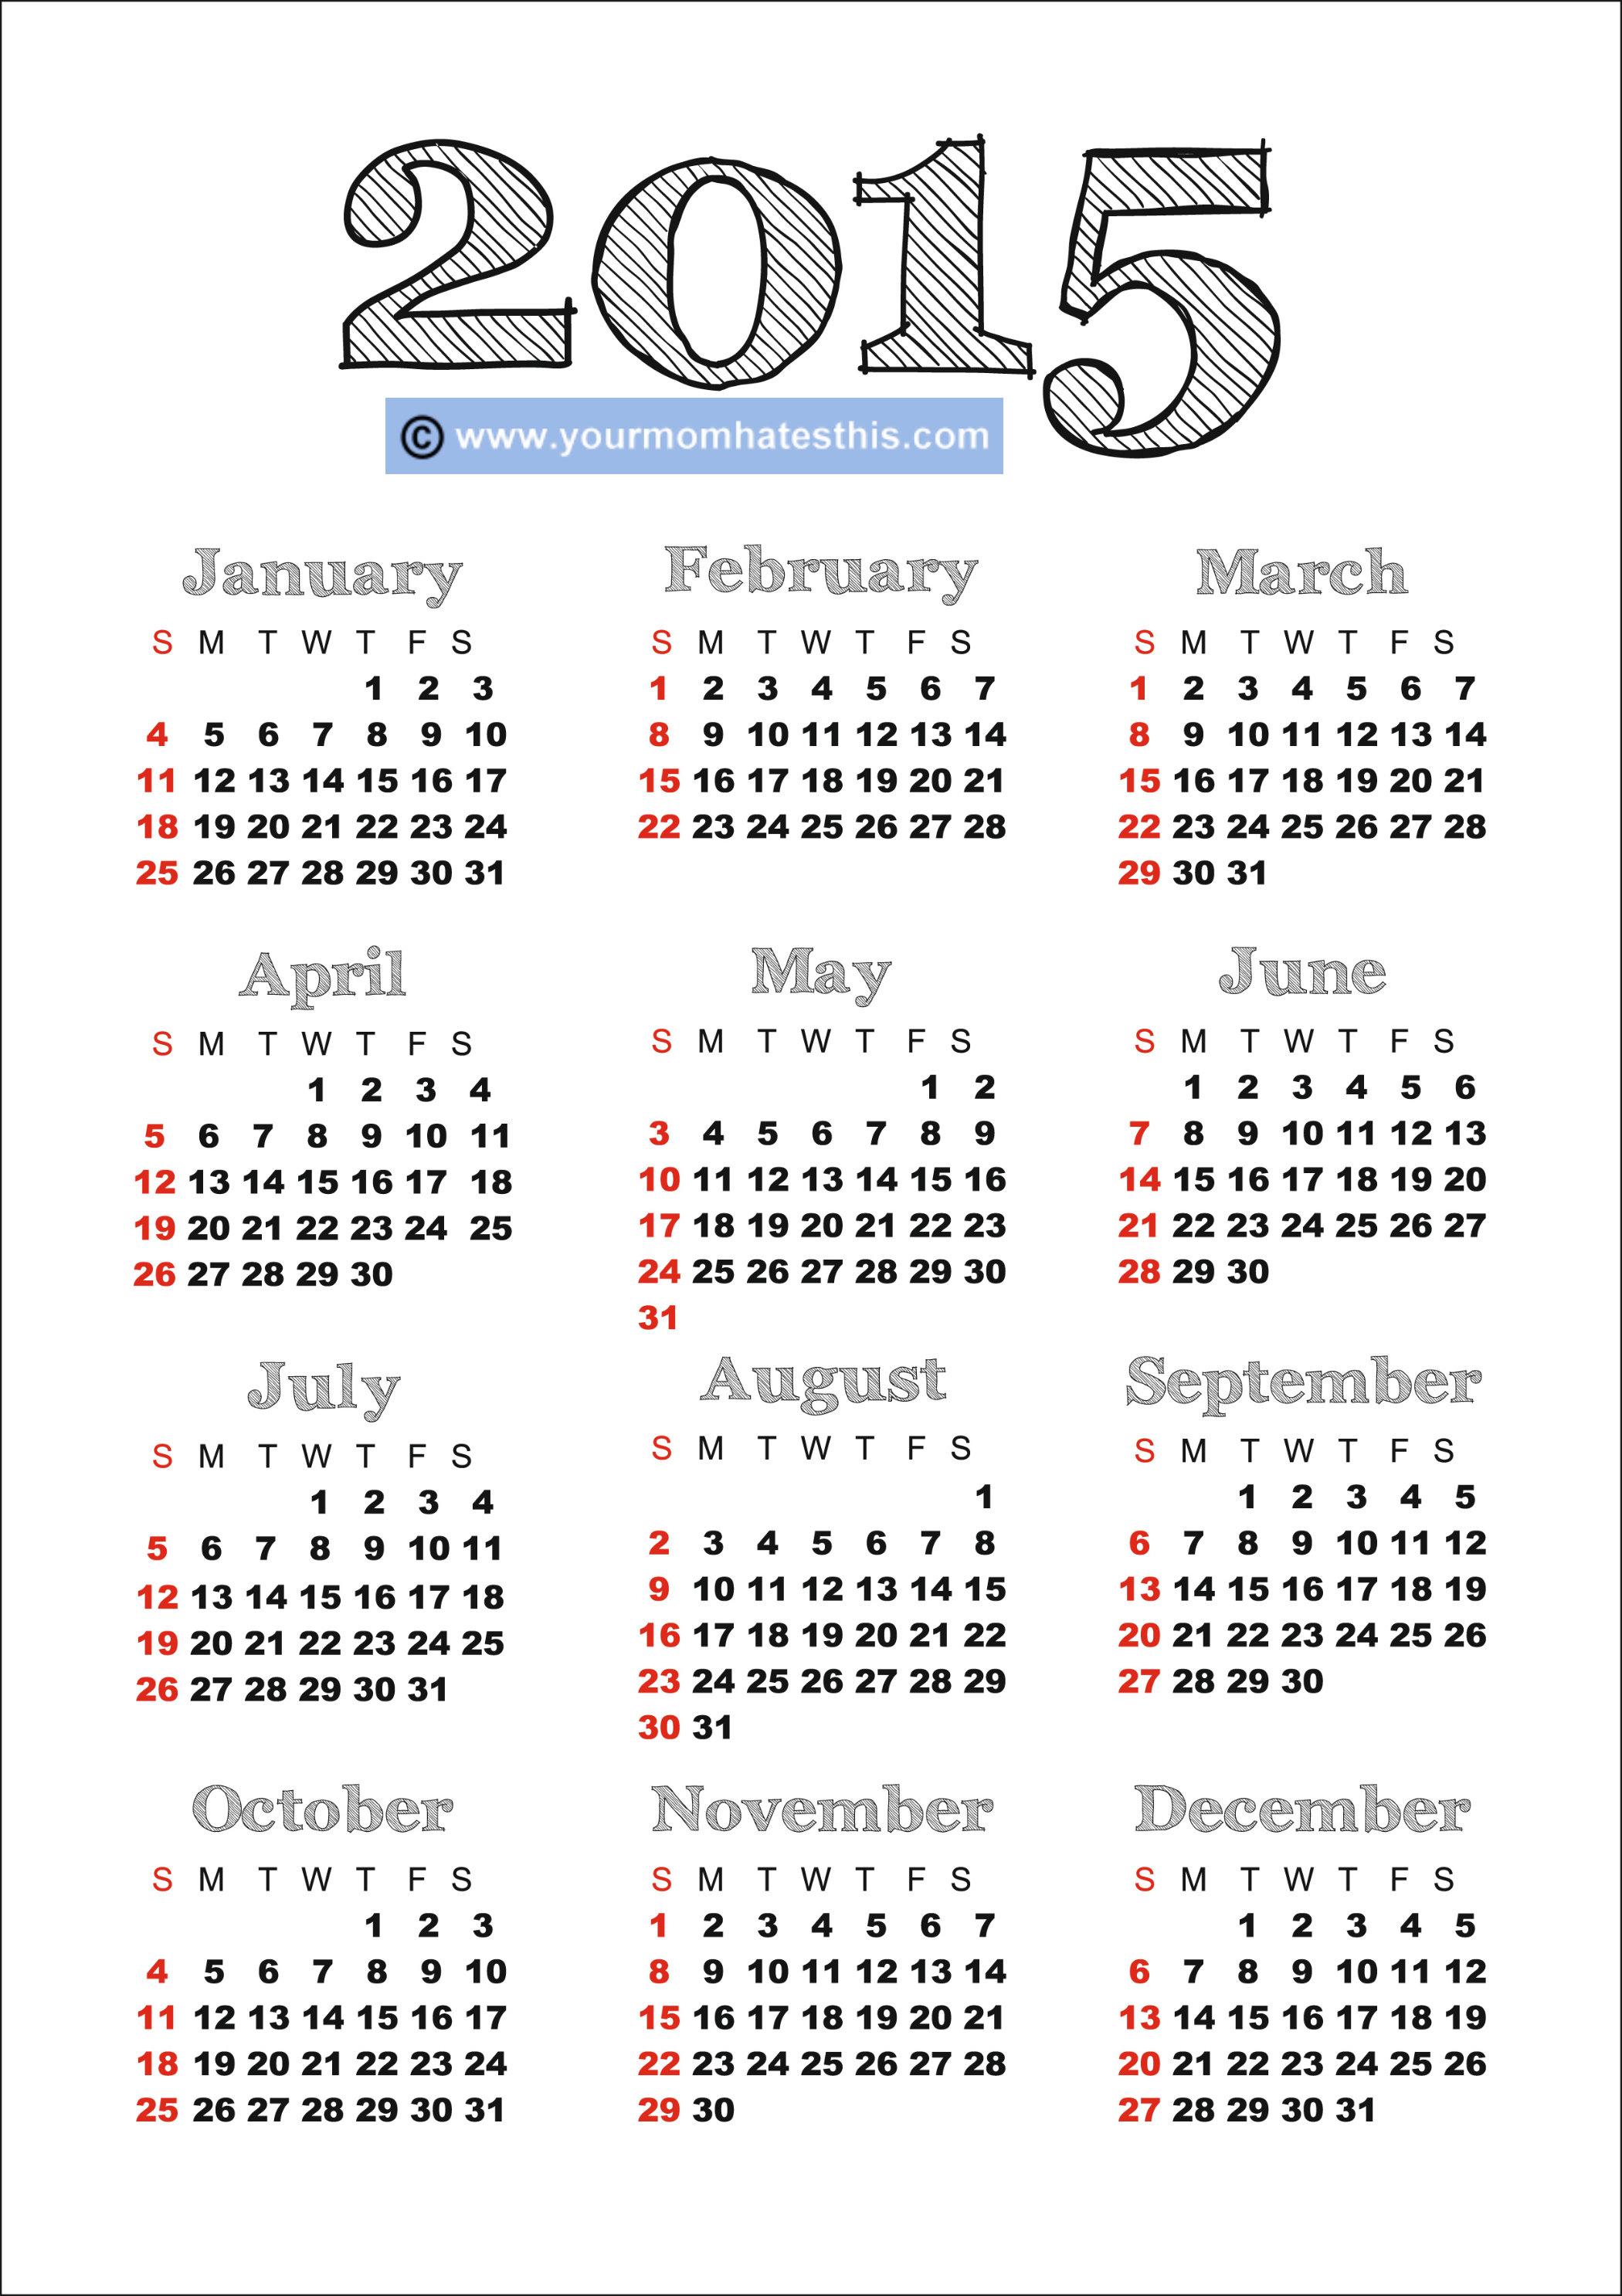 Calendar 2015 Free To Print - Tunu.redmini.co